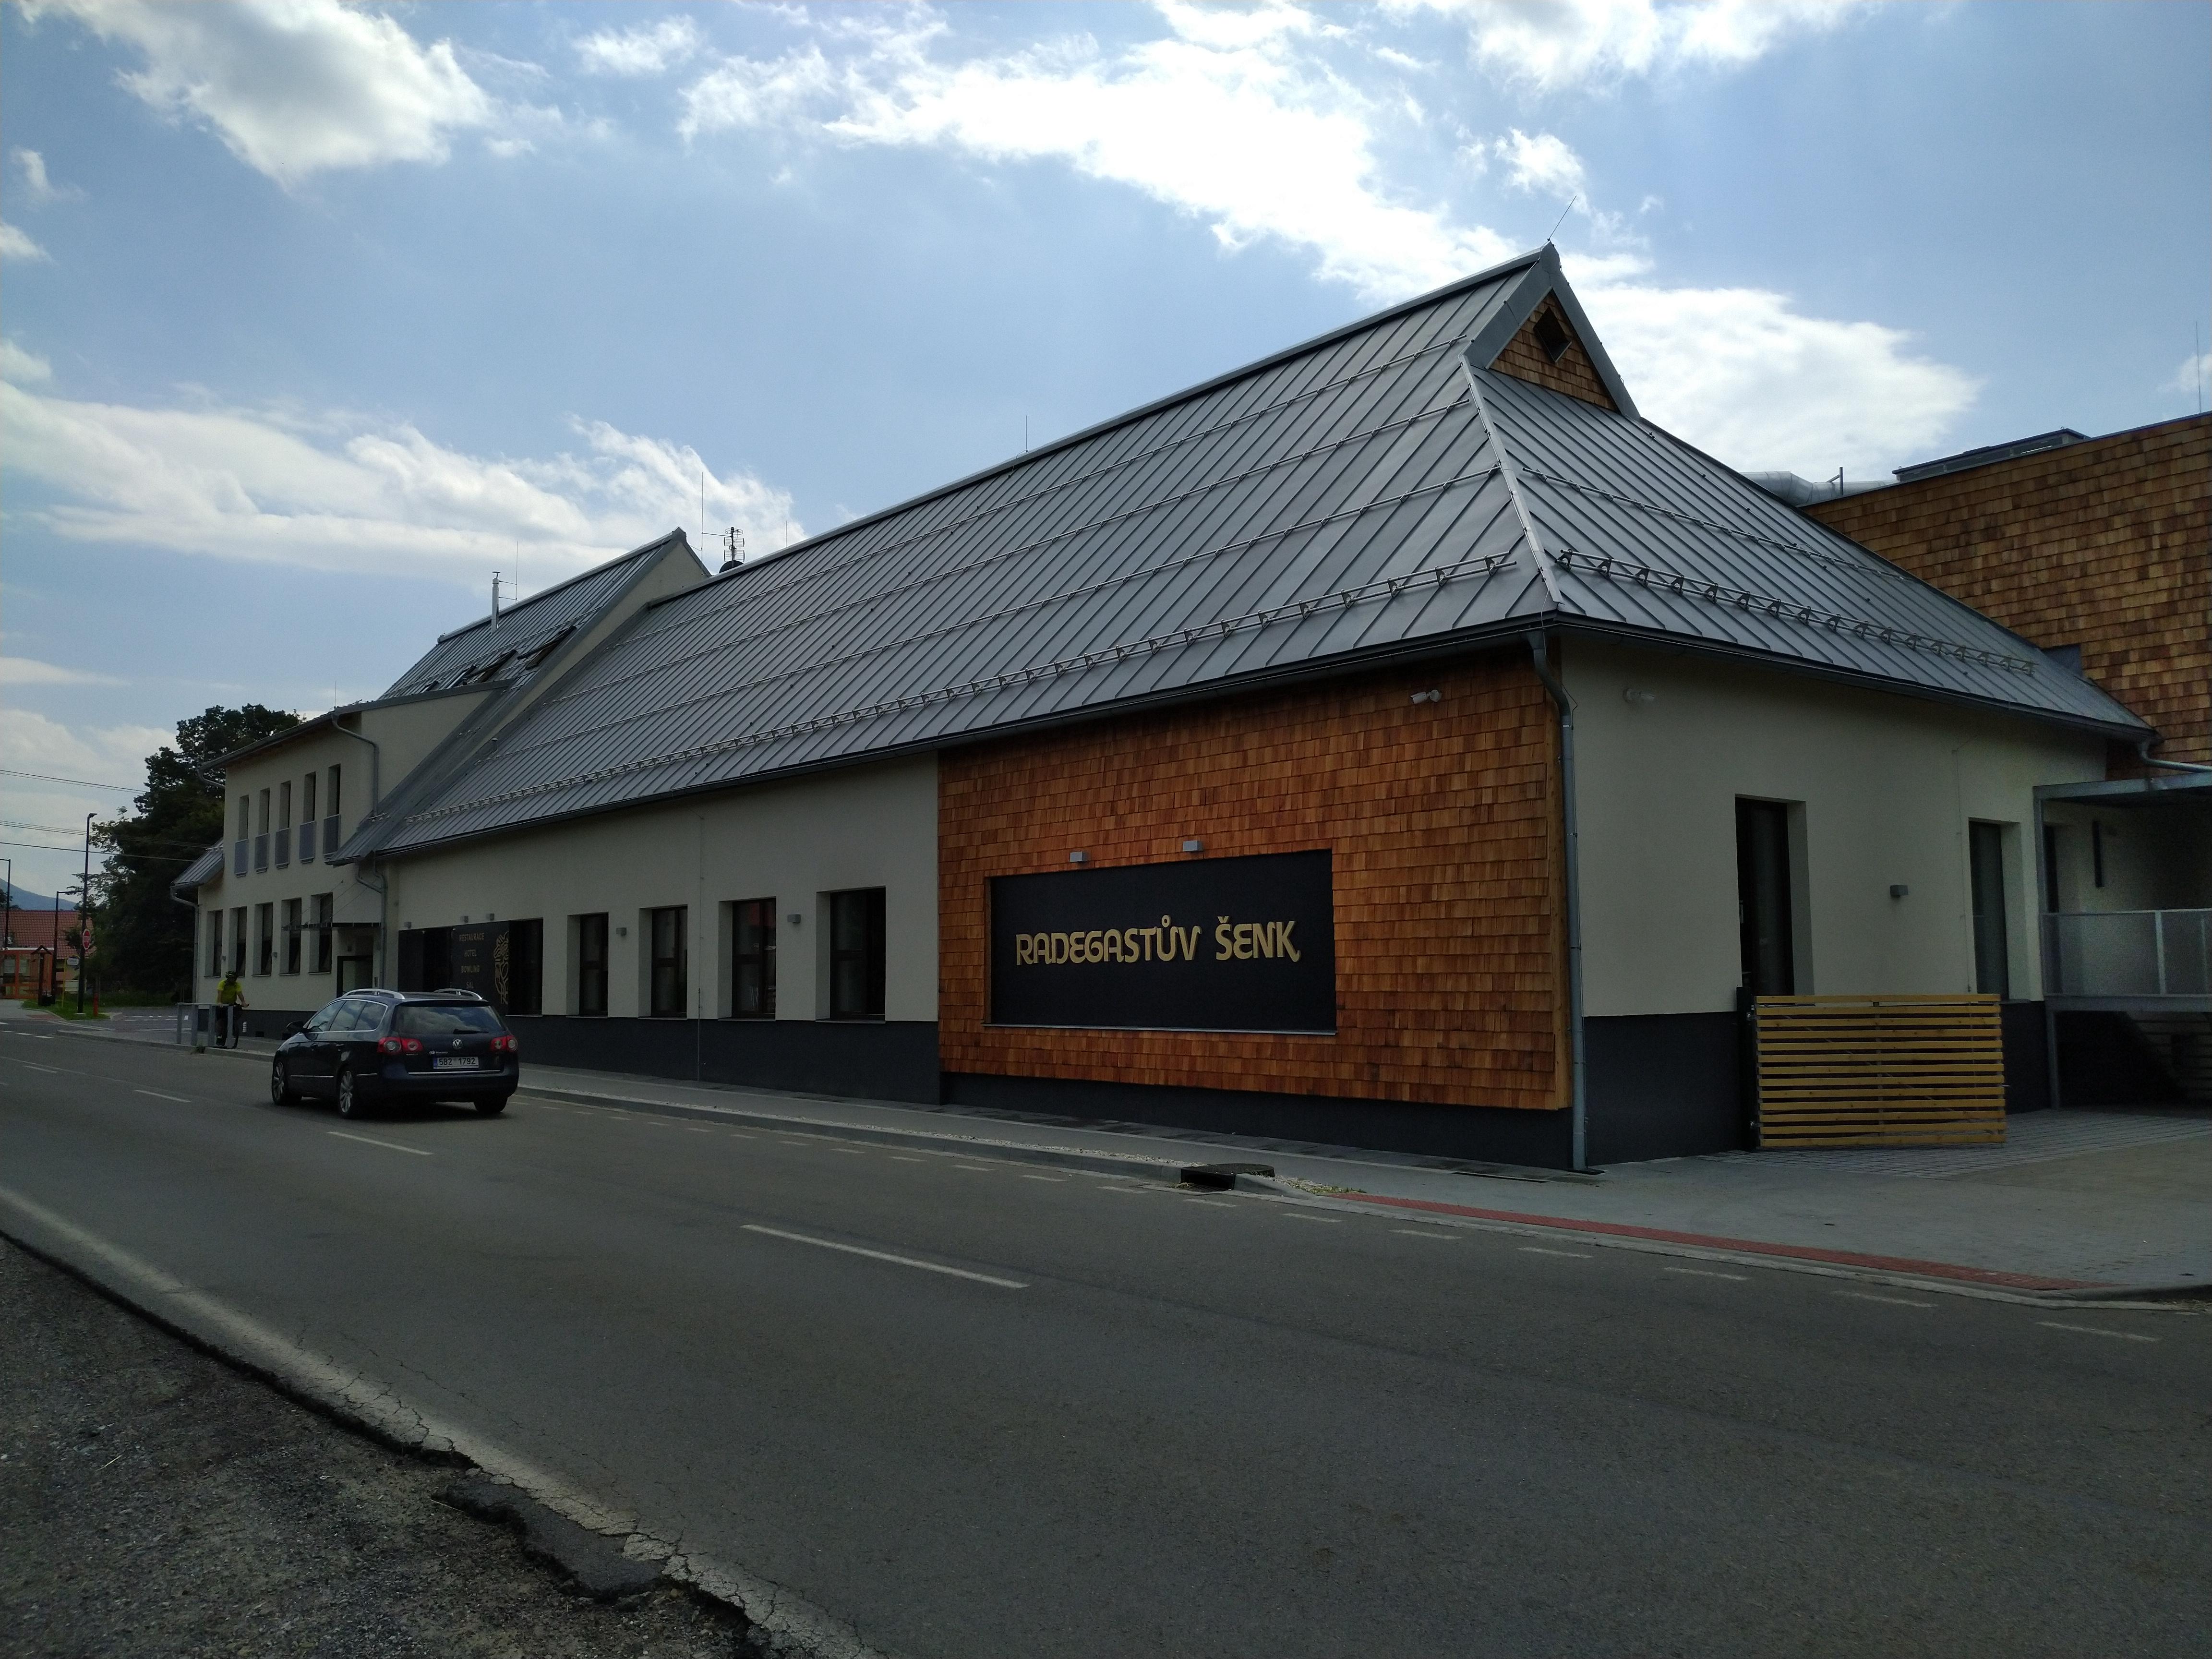 ART OF ZINC 2020 Střecha 3. místo_TB MONT Morava s. r. o., RHEINZINK-CLASSIC walzblank